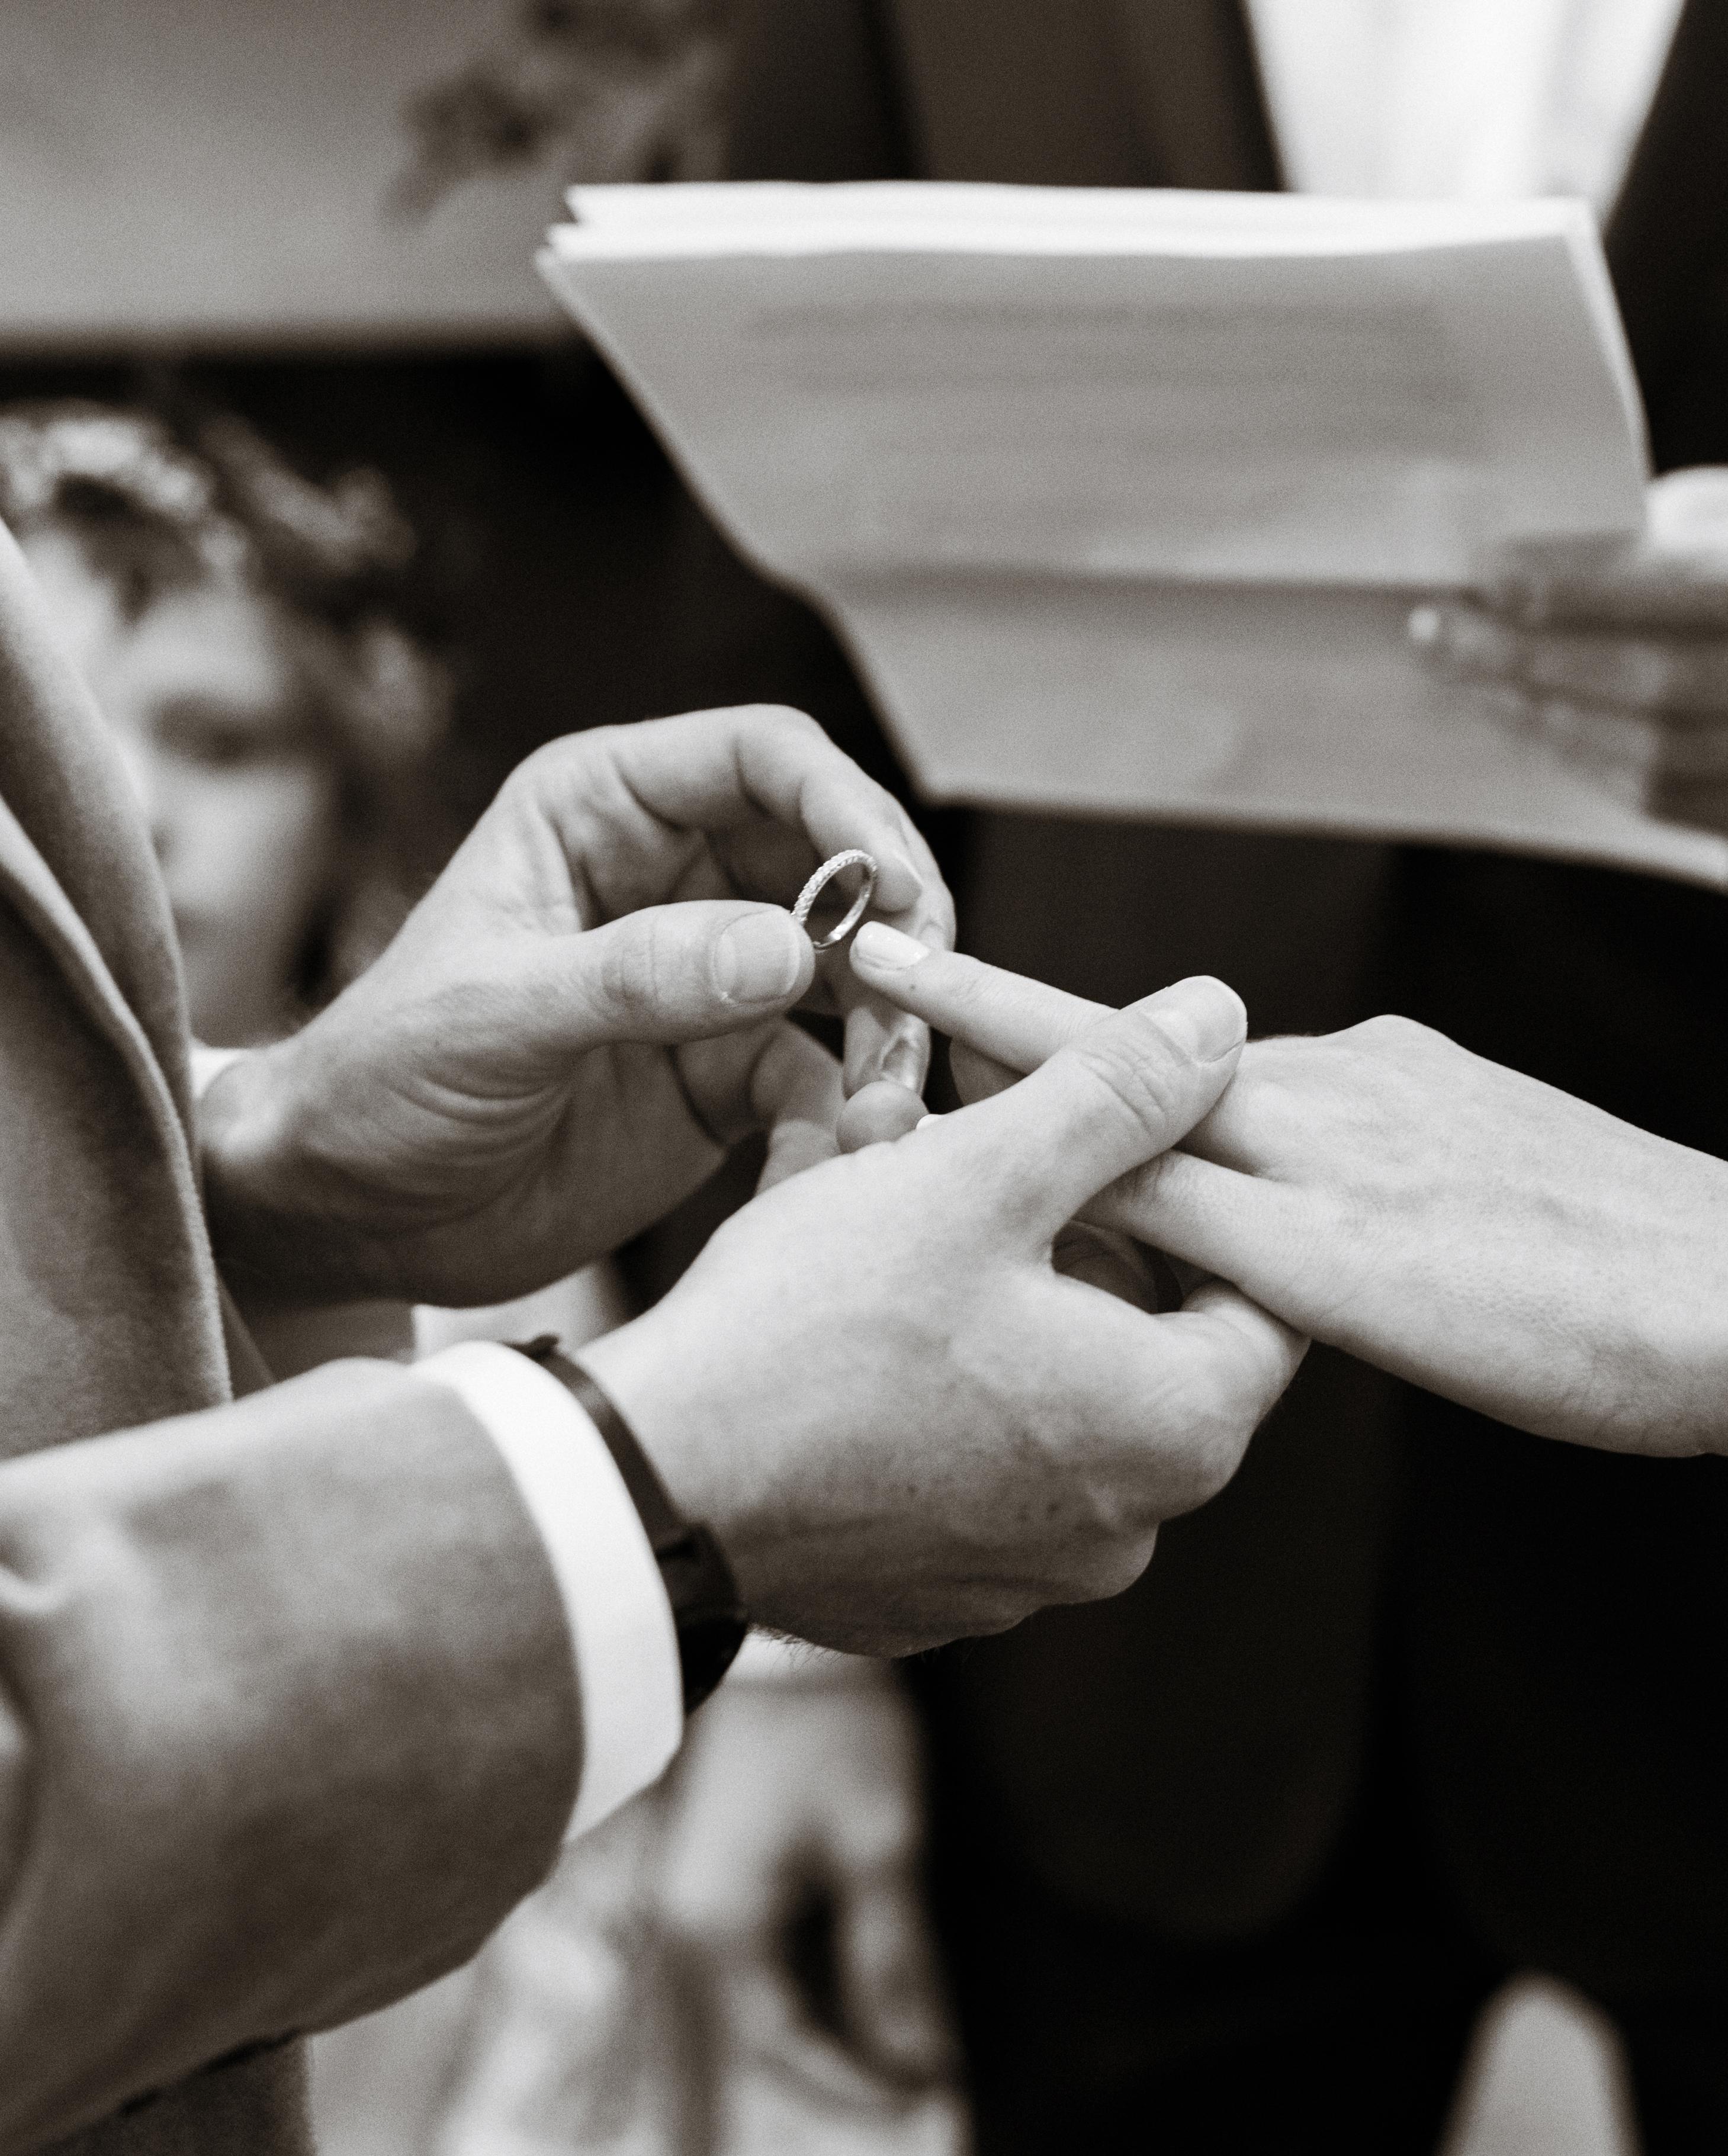 rachel-tyson-wedding-rings-072-s112158-0915.jpg